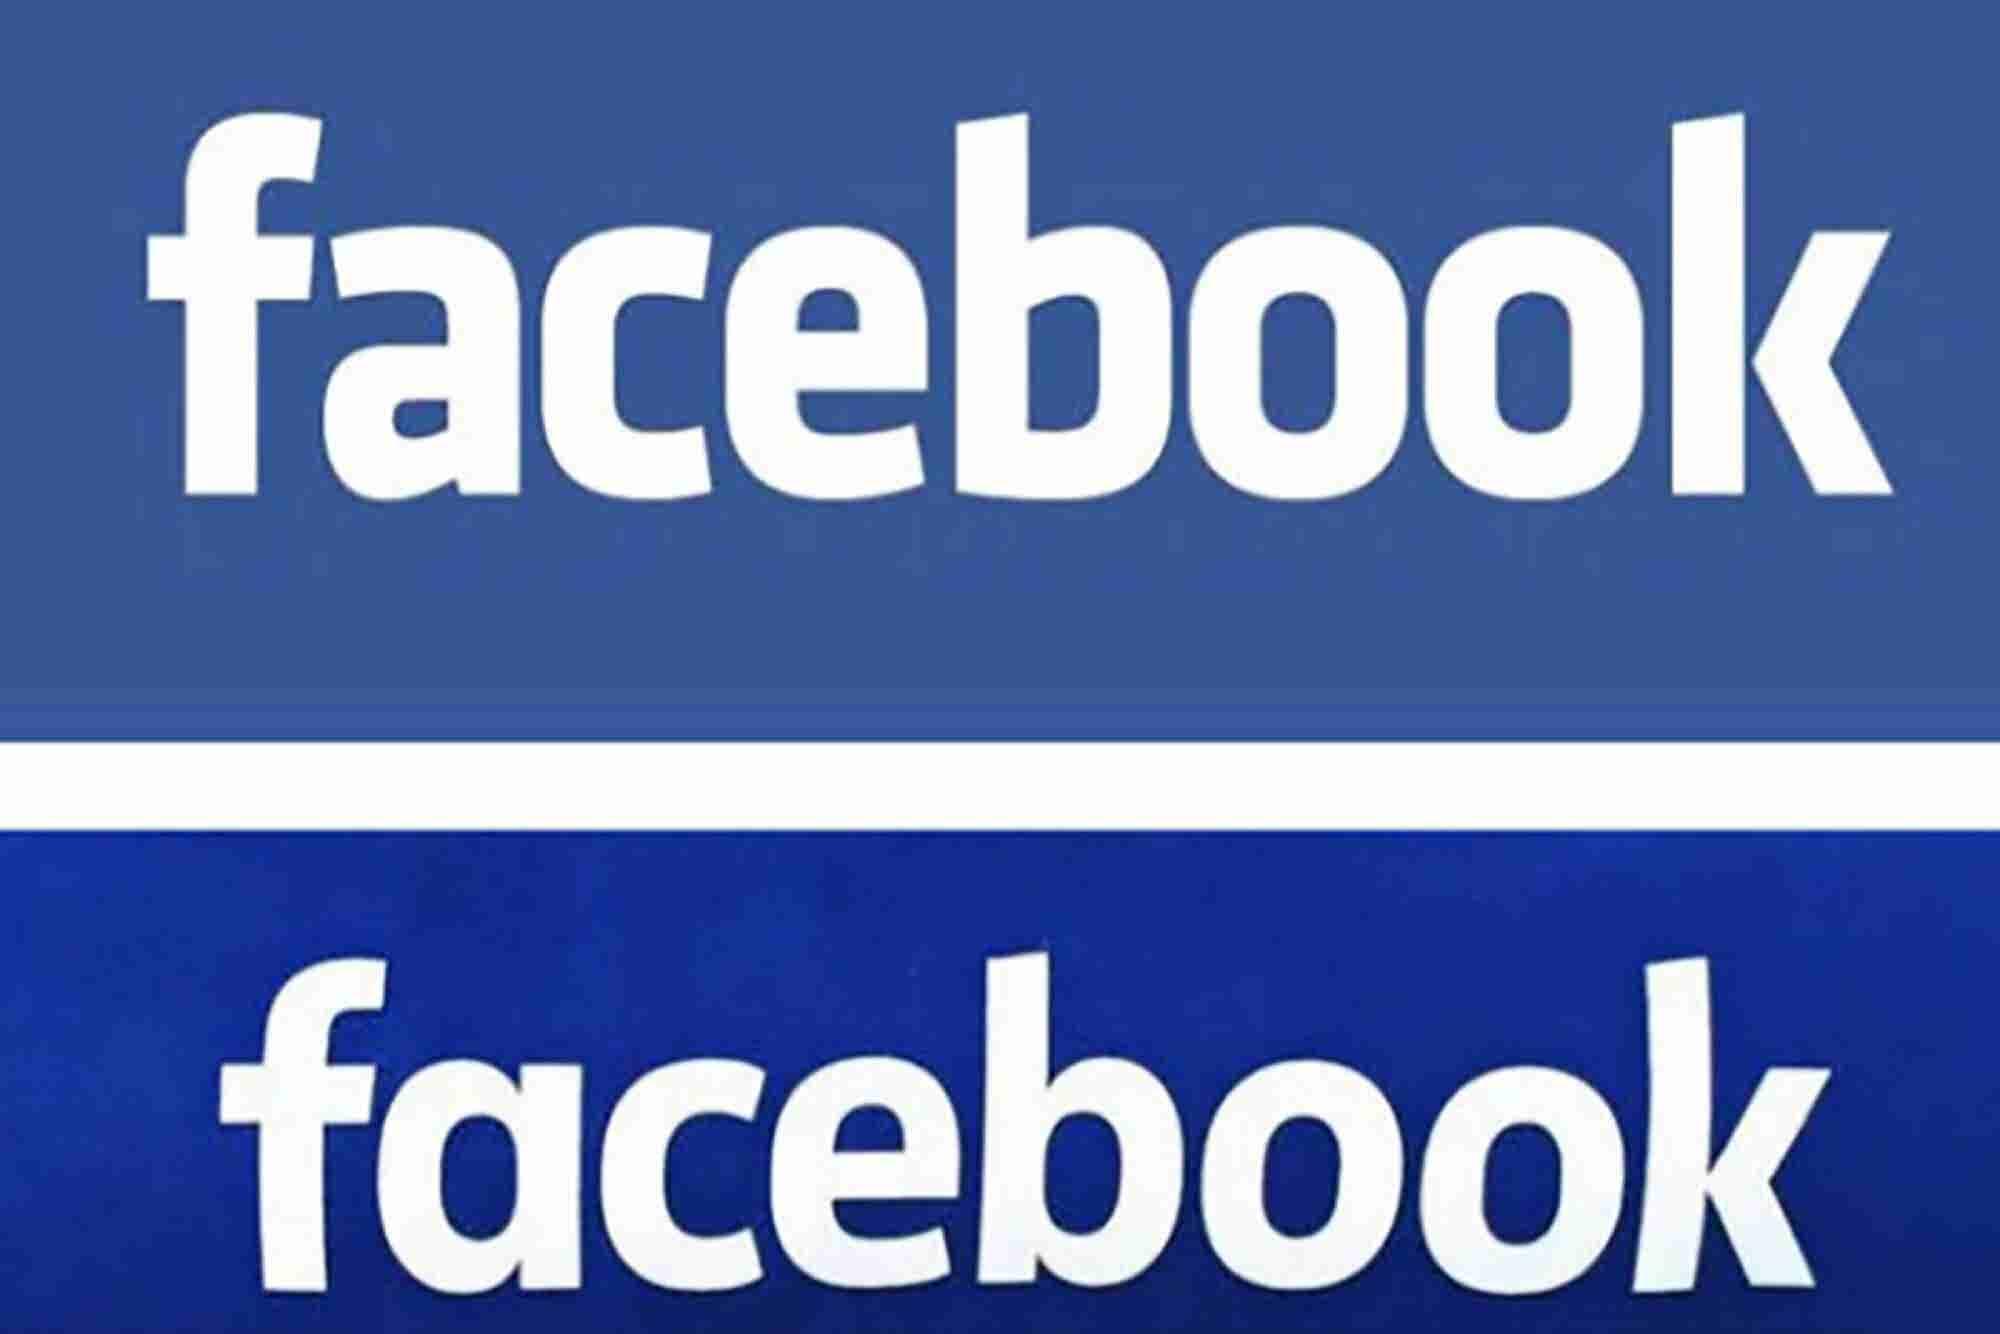 Facebook cambia de logo…levemente